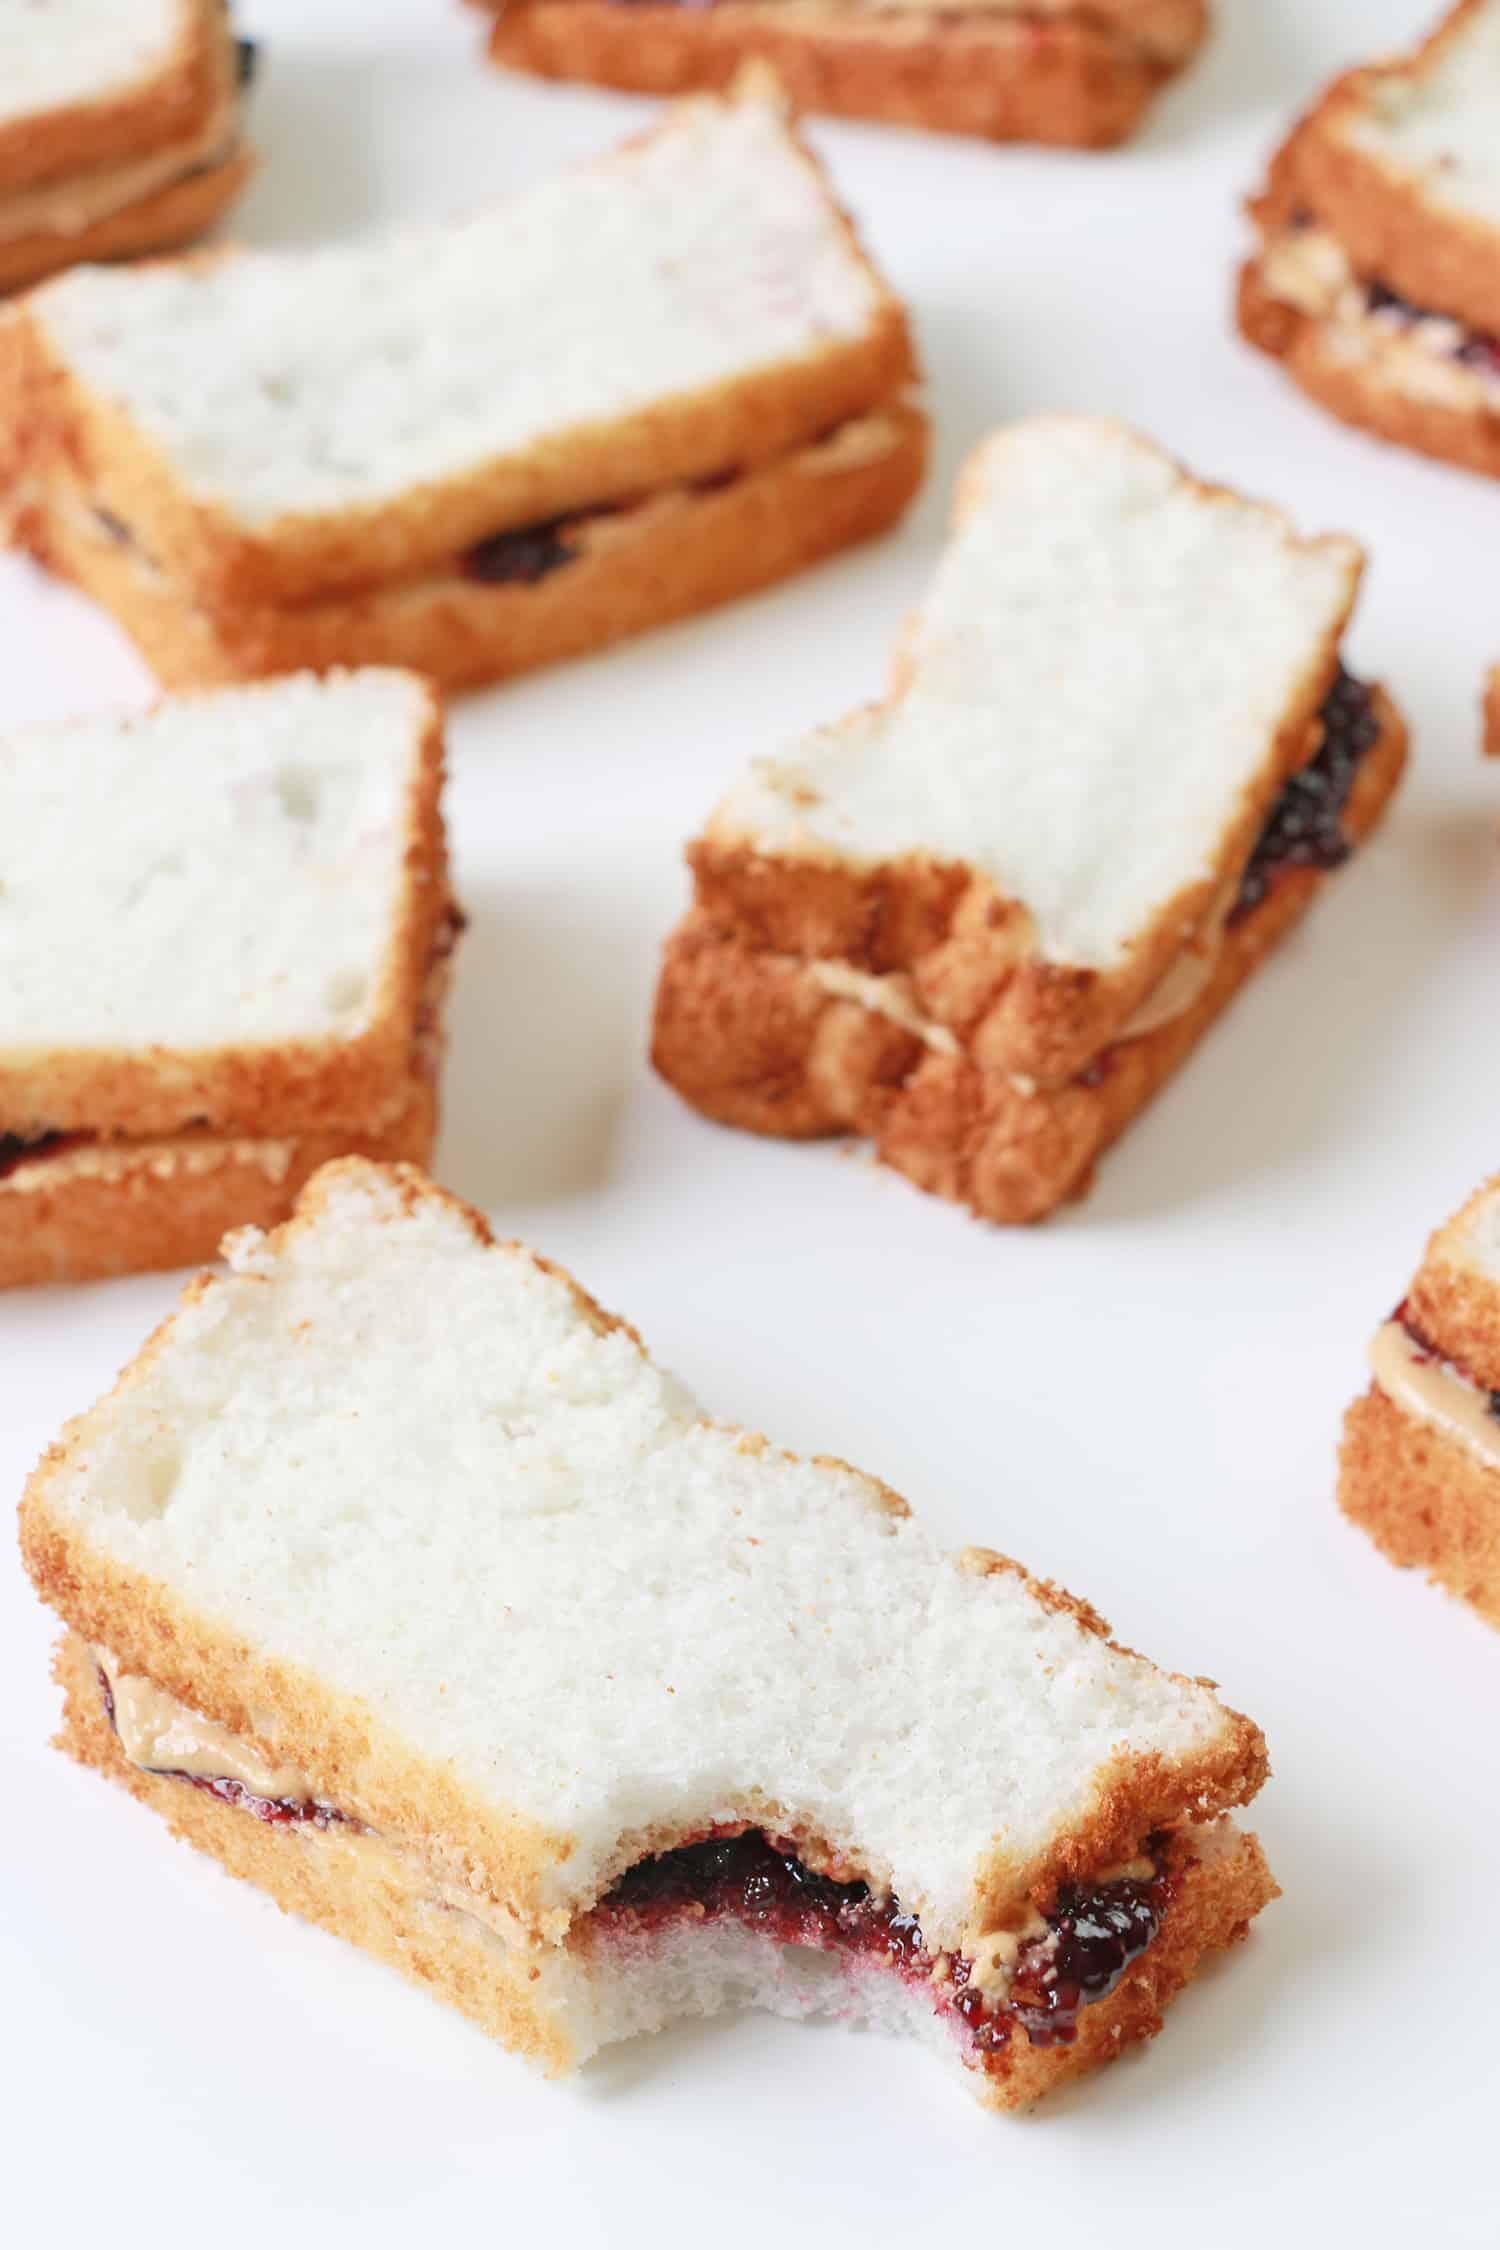 PB & J Sandwich-Kuchen